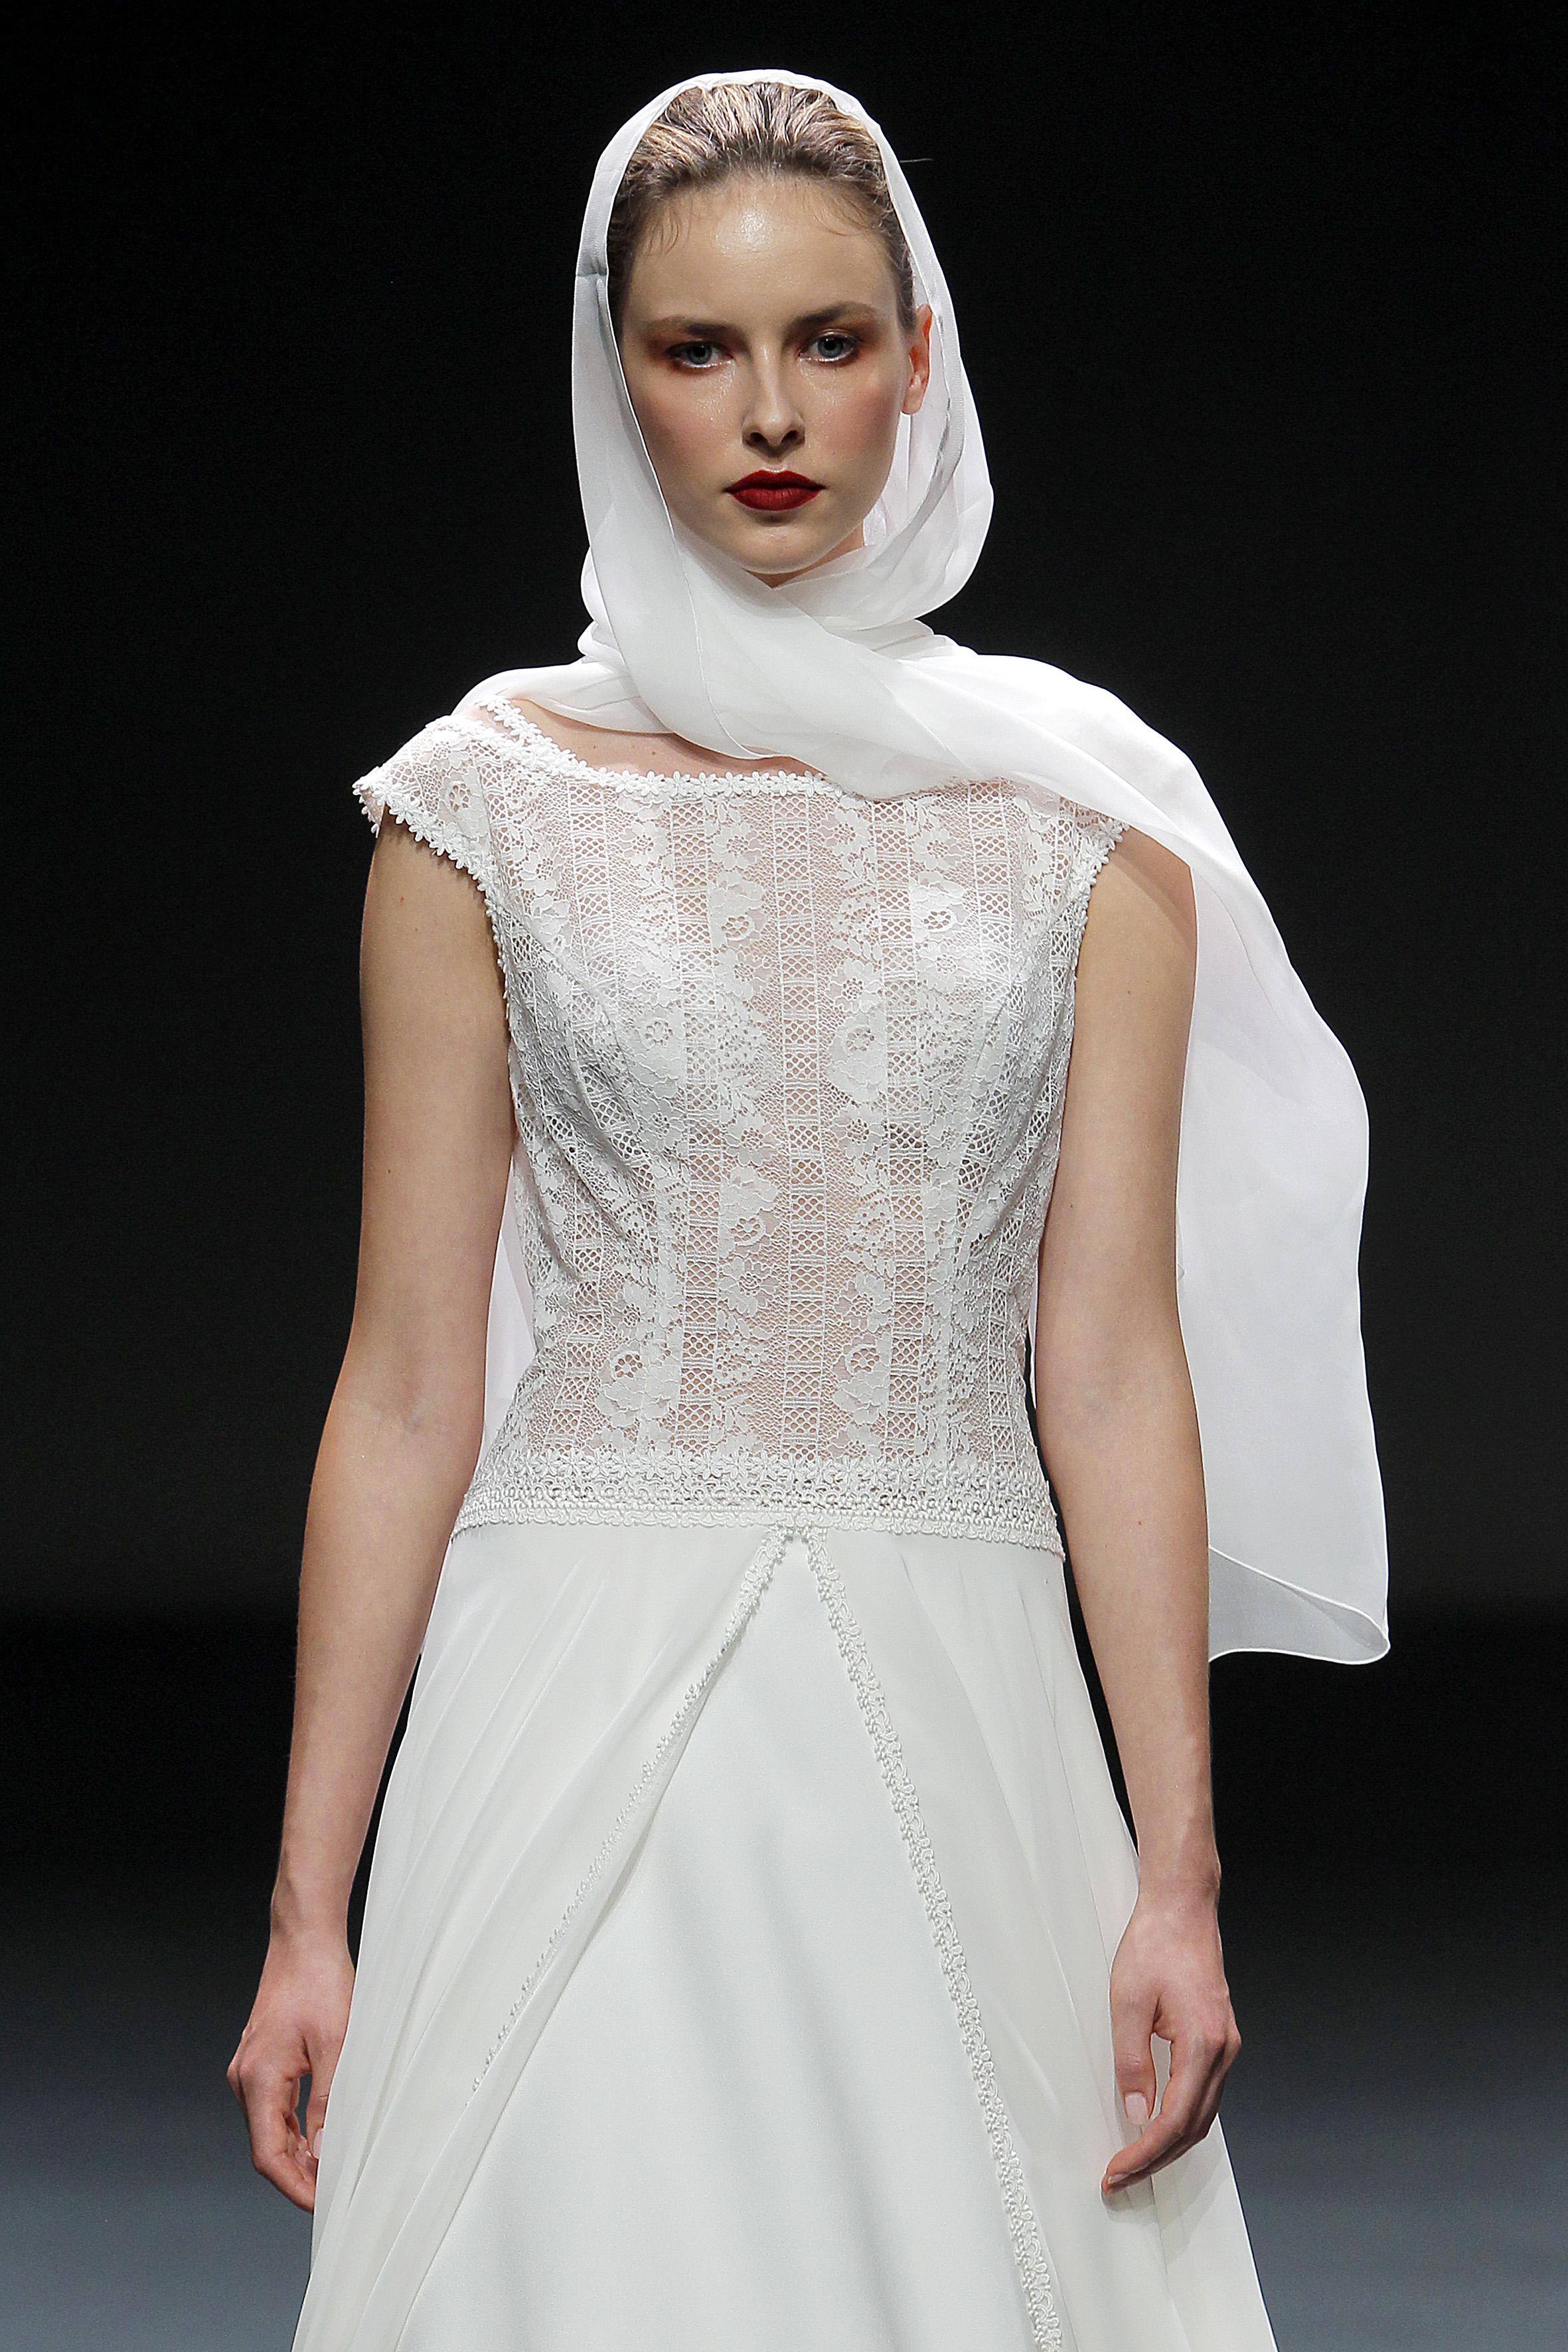 Desfile de Cymbeline Paris Couture en VBBFW20 experience Primavera Veranoline_028.jpg